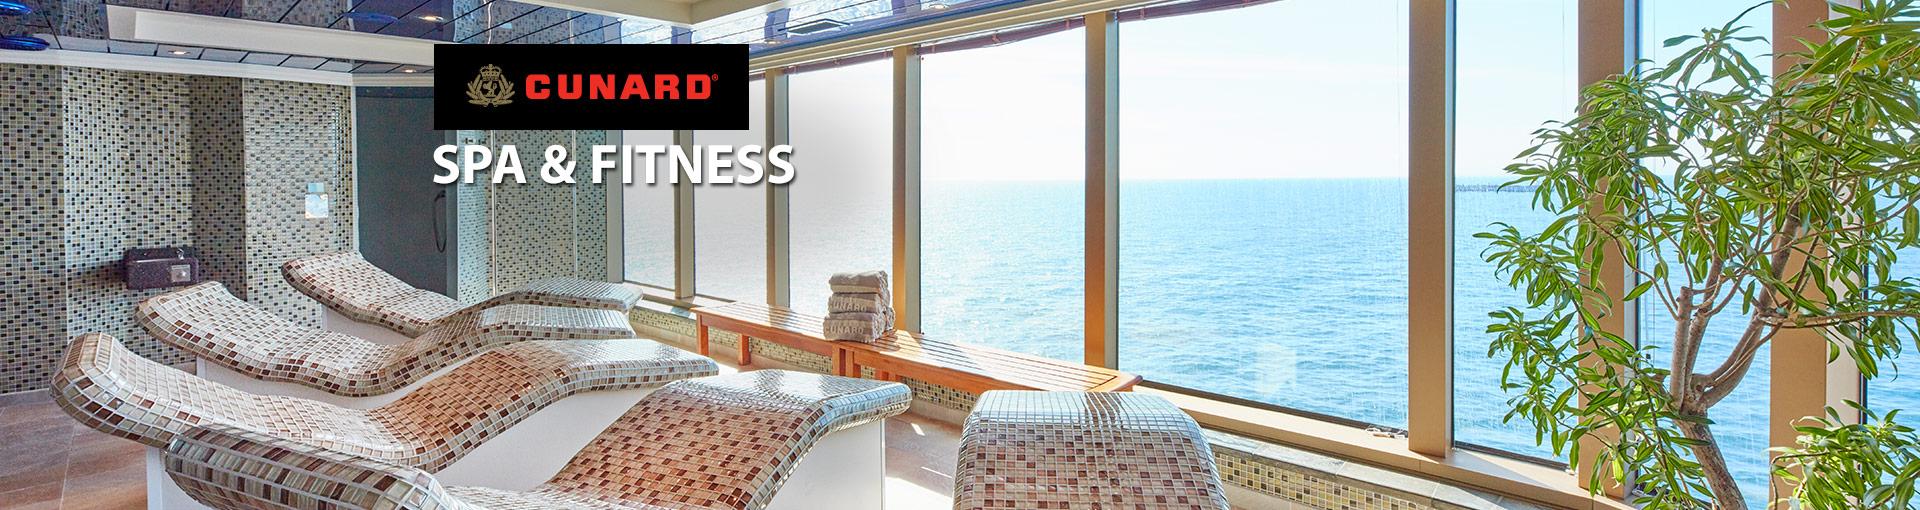 Cunard Line Spa & Fitness